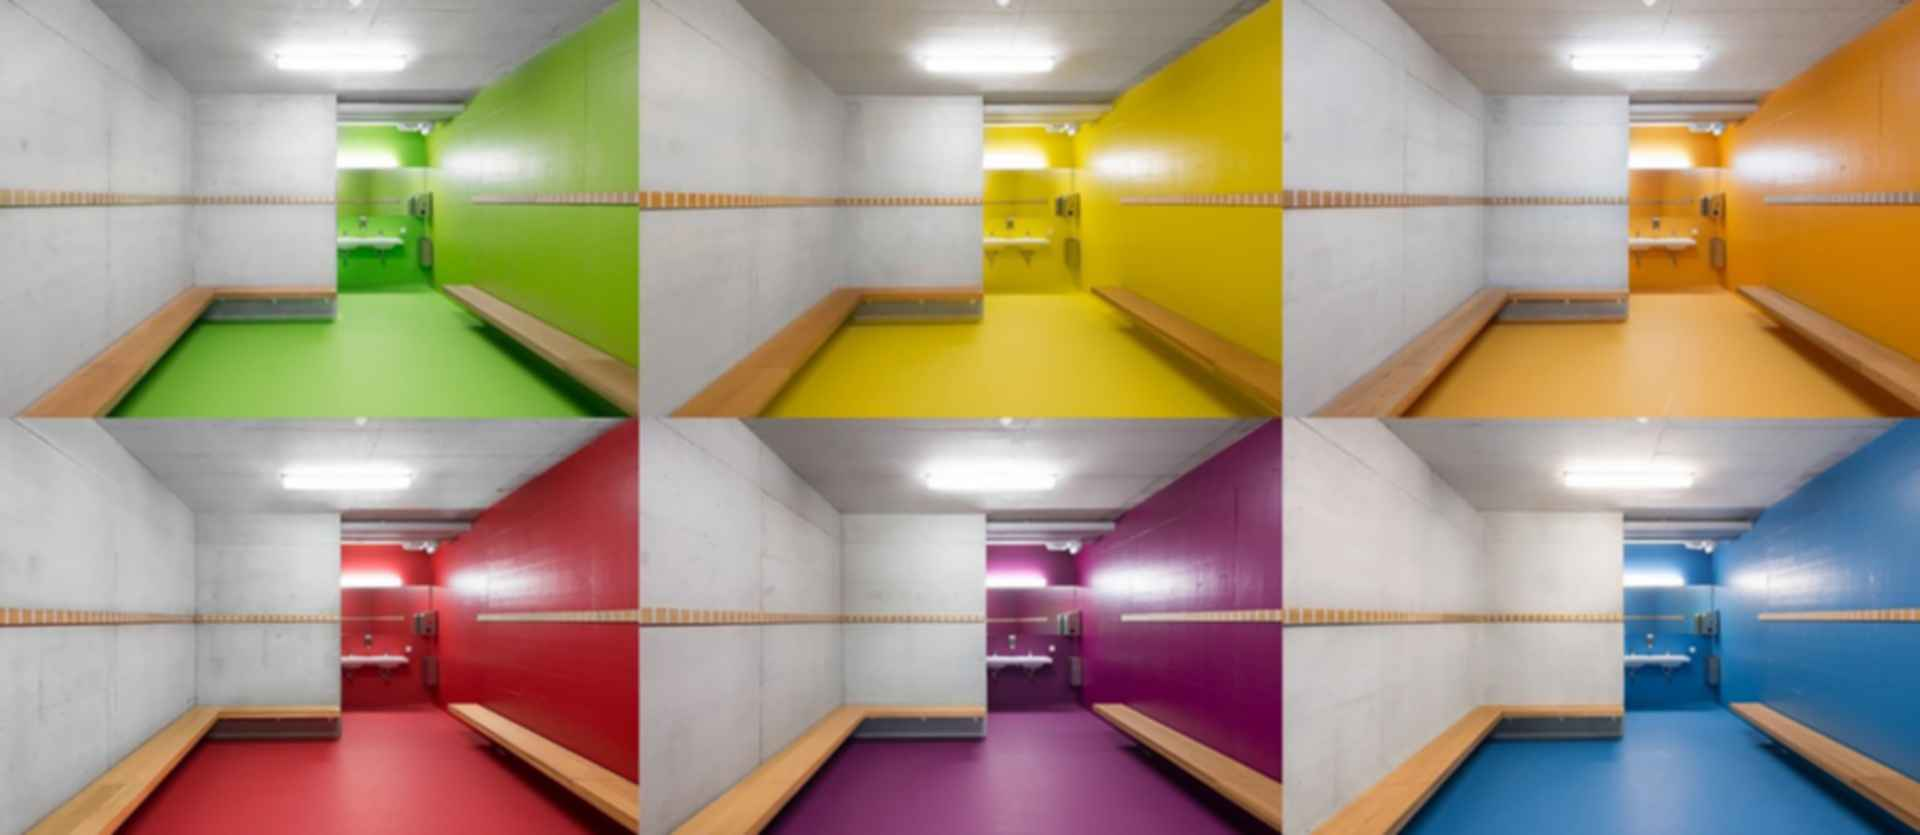 Neumatt Sports Facility - Interior Bathrooms